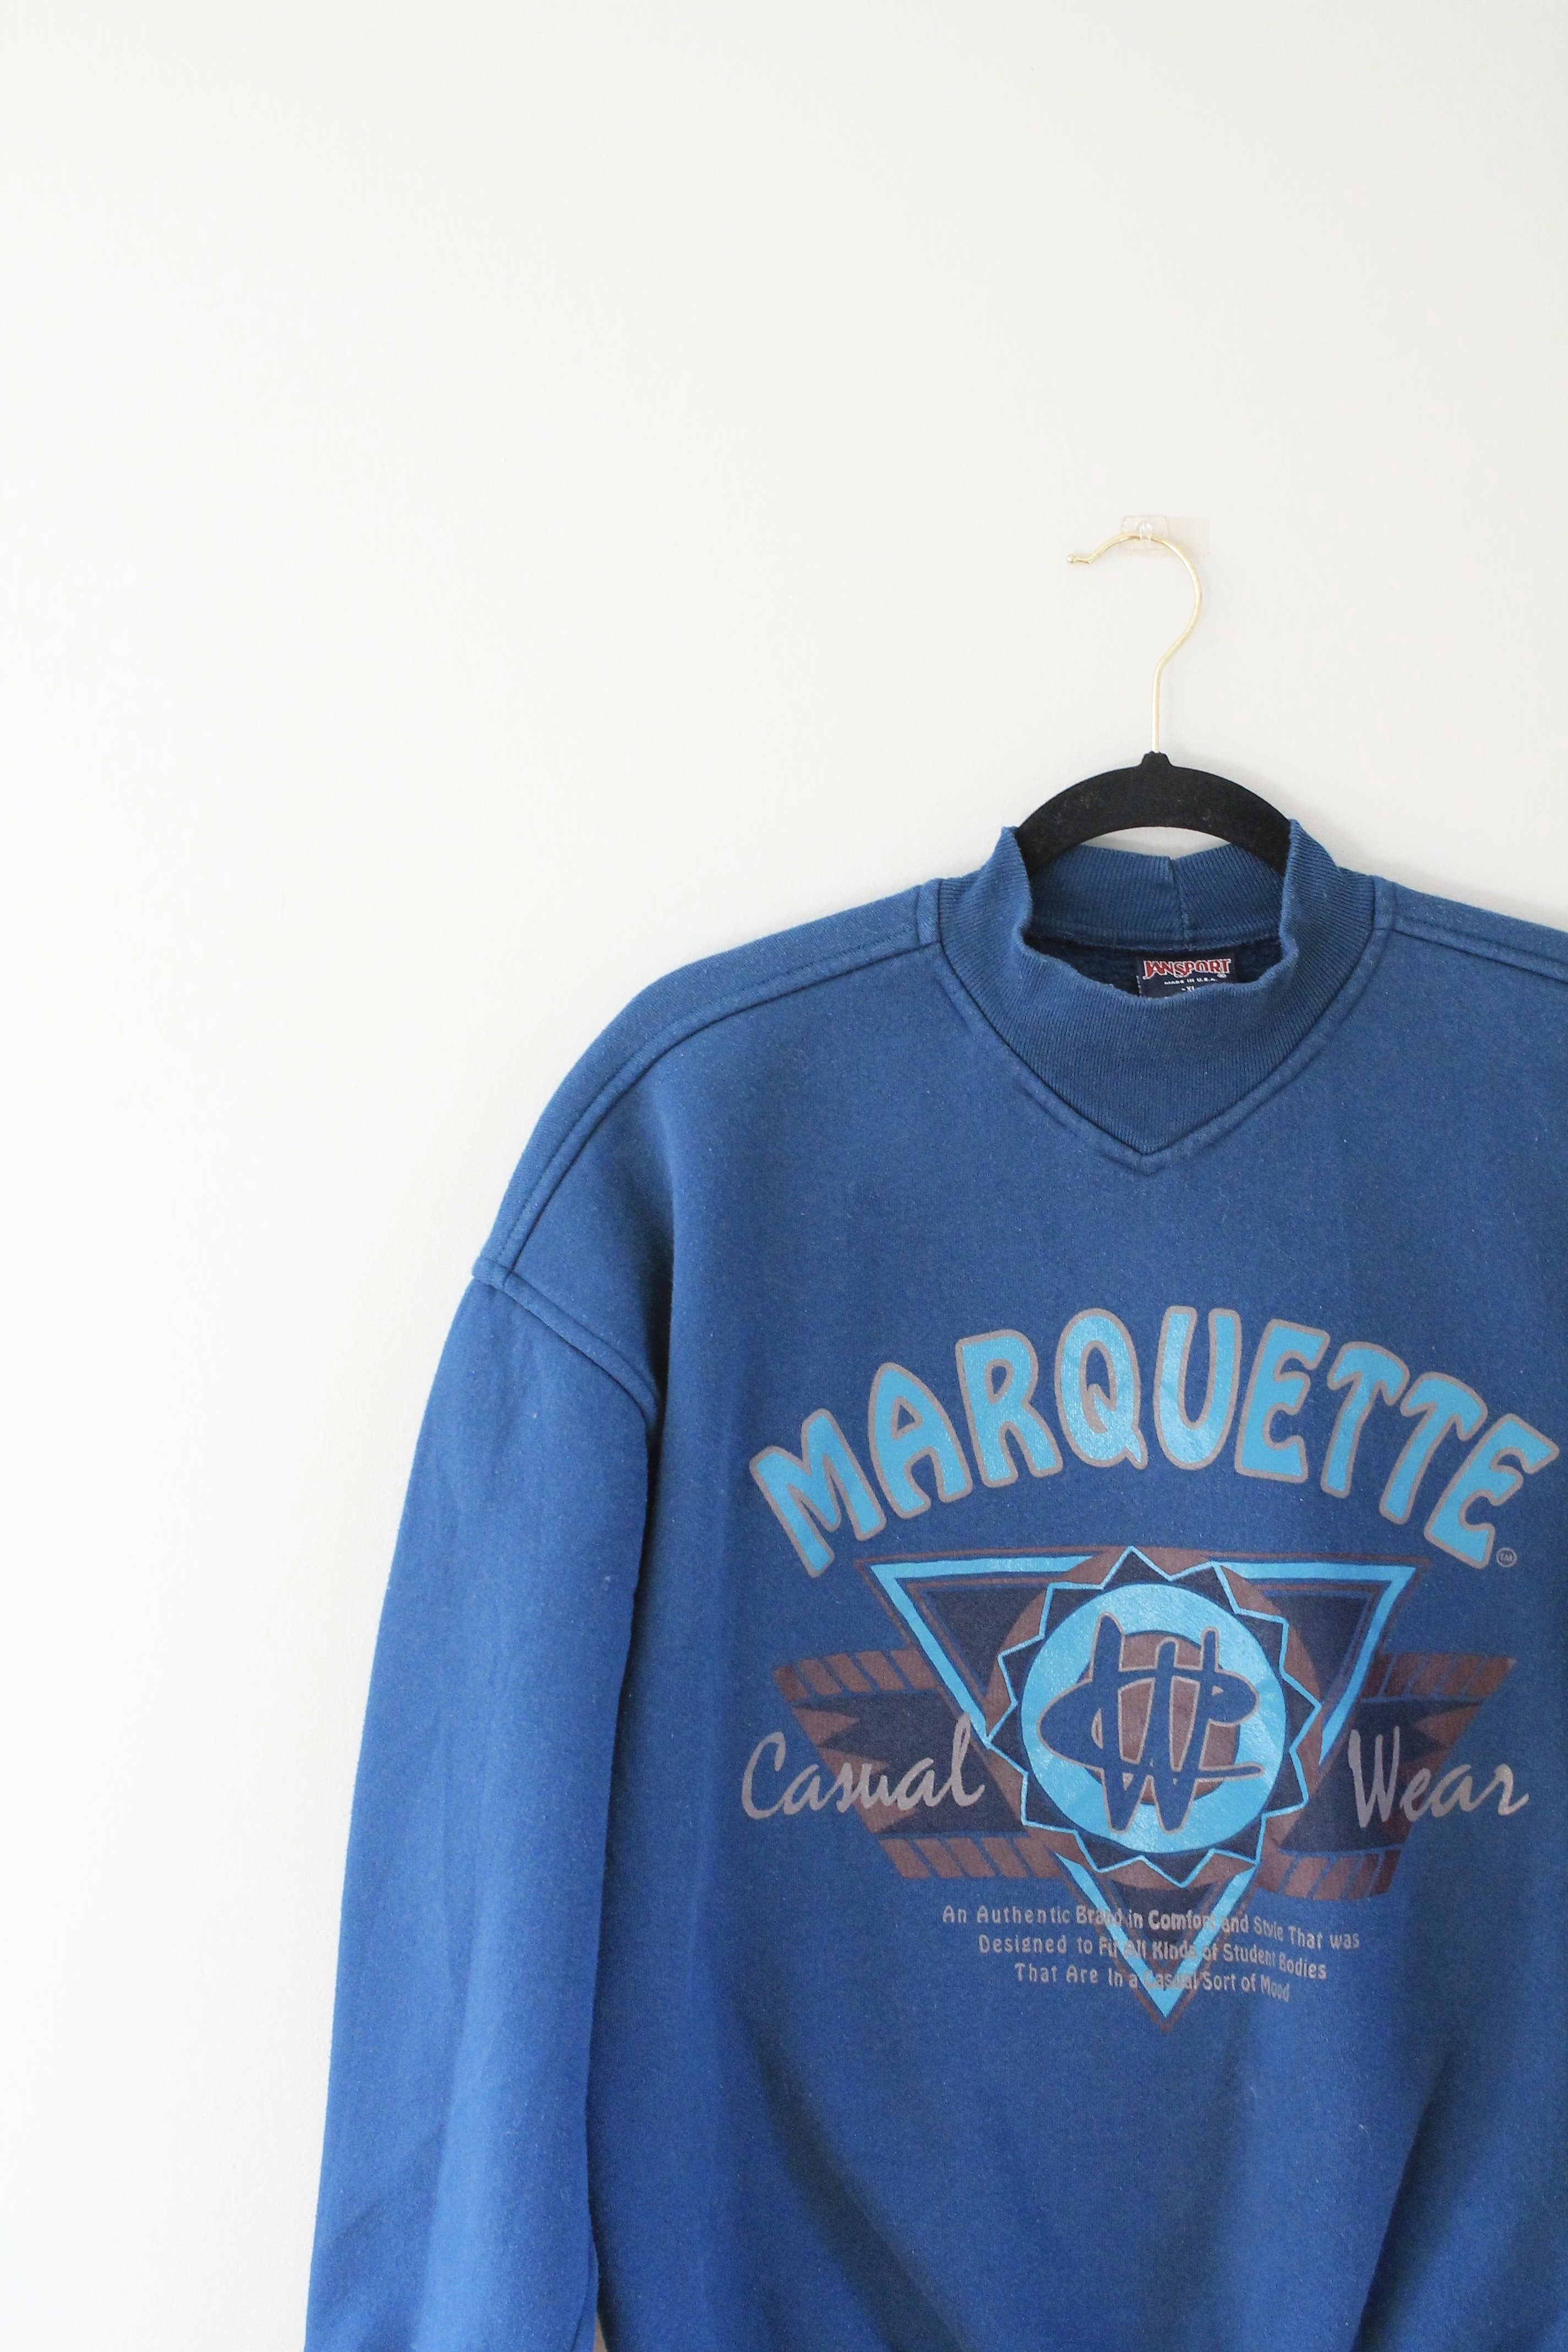 Marquette University Rare Vintage Sweatshirt Size Xl Default Title Sweatshirts Vintage Sweatshirt University Sweatshirts [ 4272 x 2848 Pixel ]